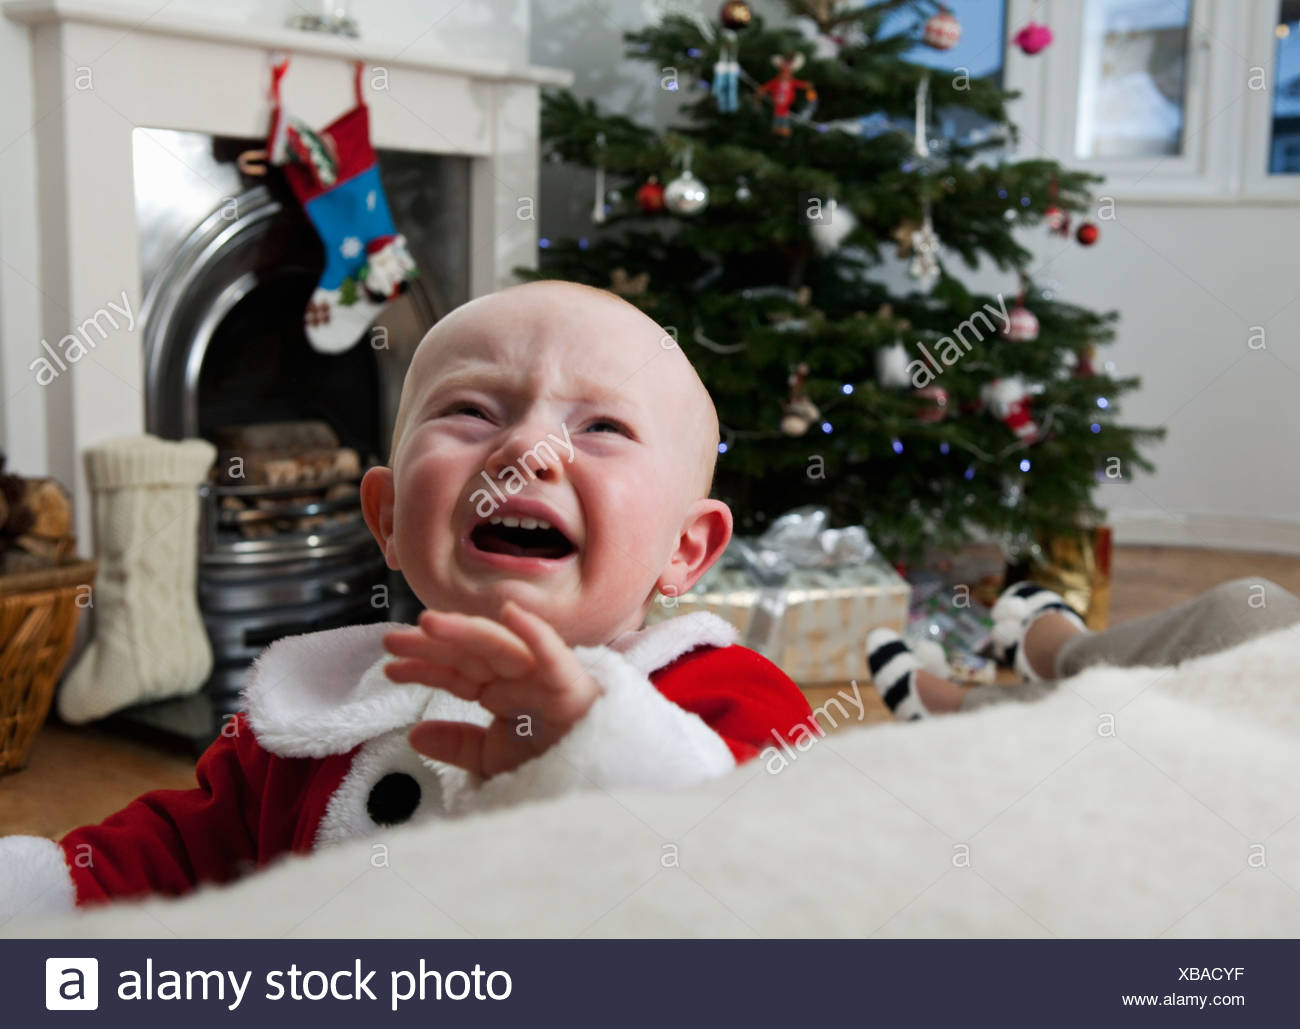 A baby crying at Christmas - Stock Image